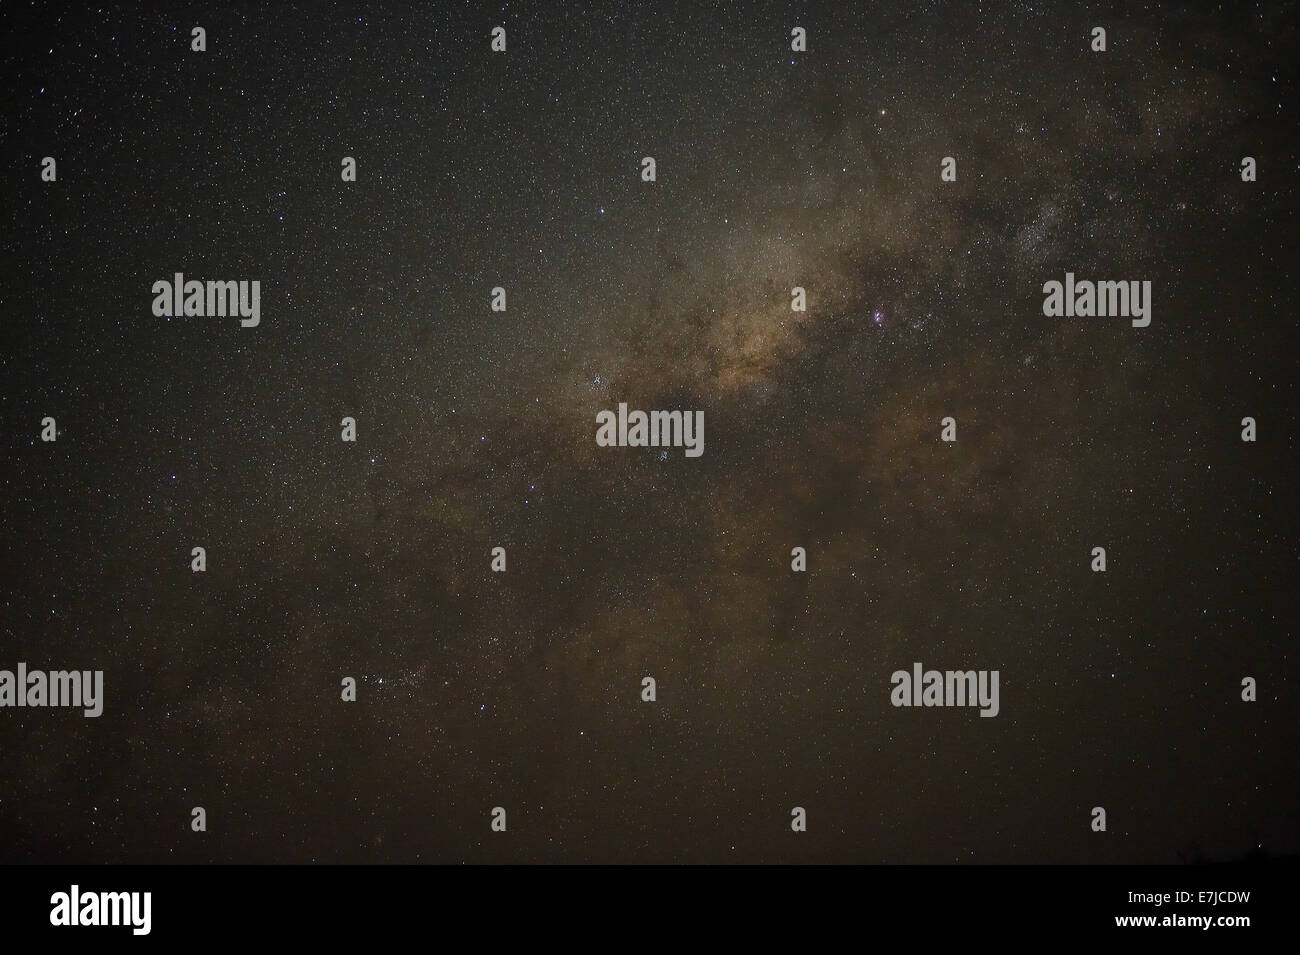 Africa, Etendeka, night, Namibia, star sky, stars, - Stock Image